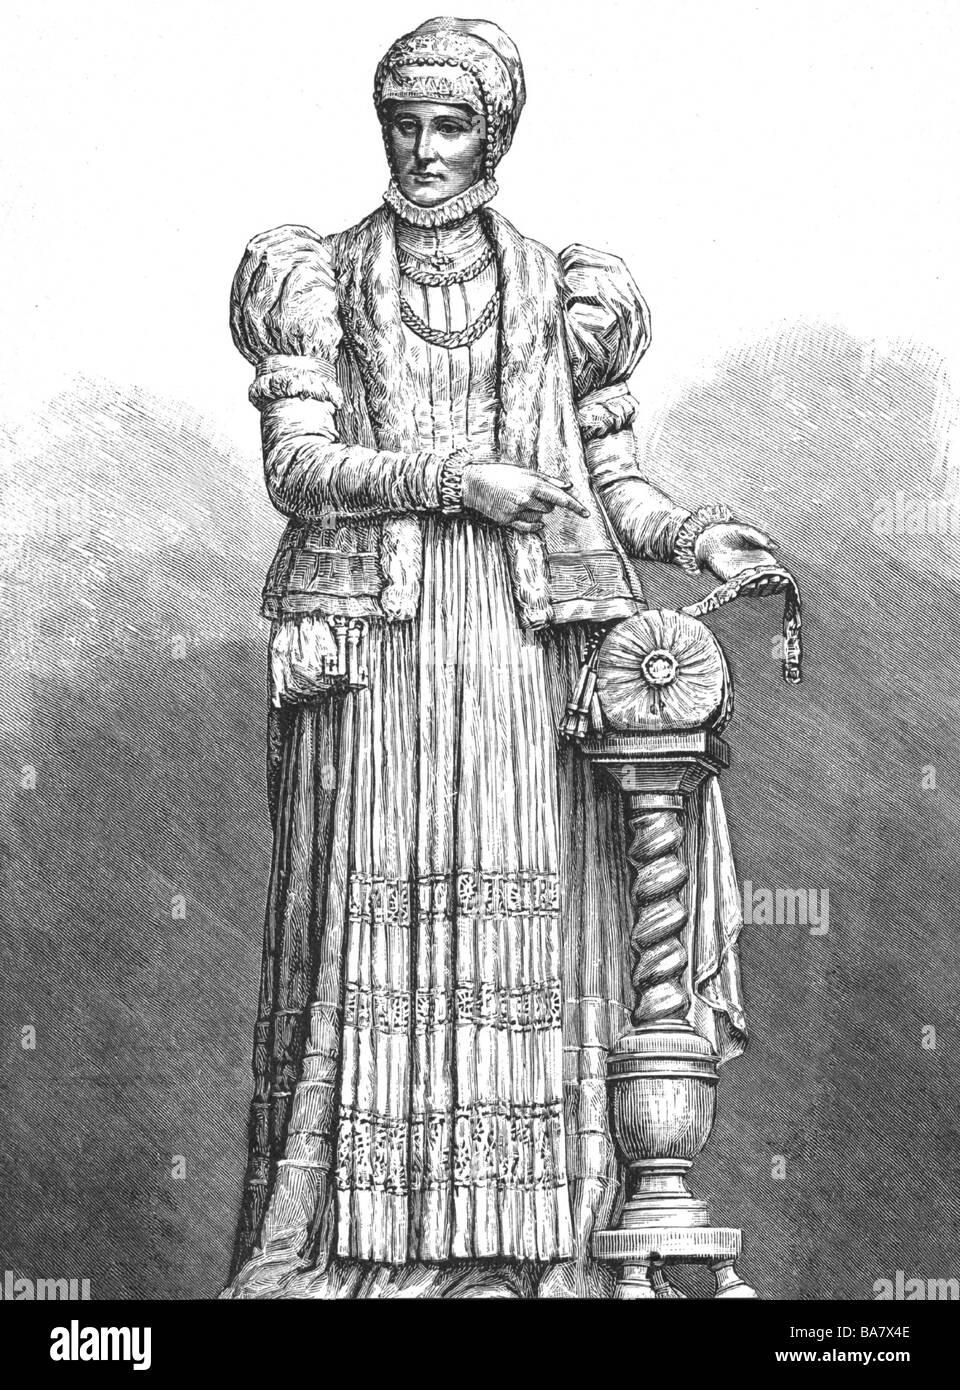 Uttmann, Barbara, 1514 - 15.10.1575, German inventor of bobbin lace making, full length, wood engraving by A. Closs, - Stock Image